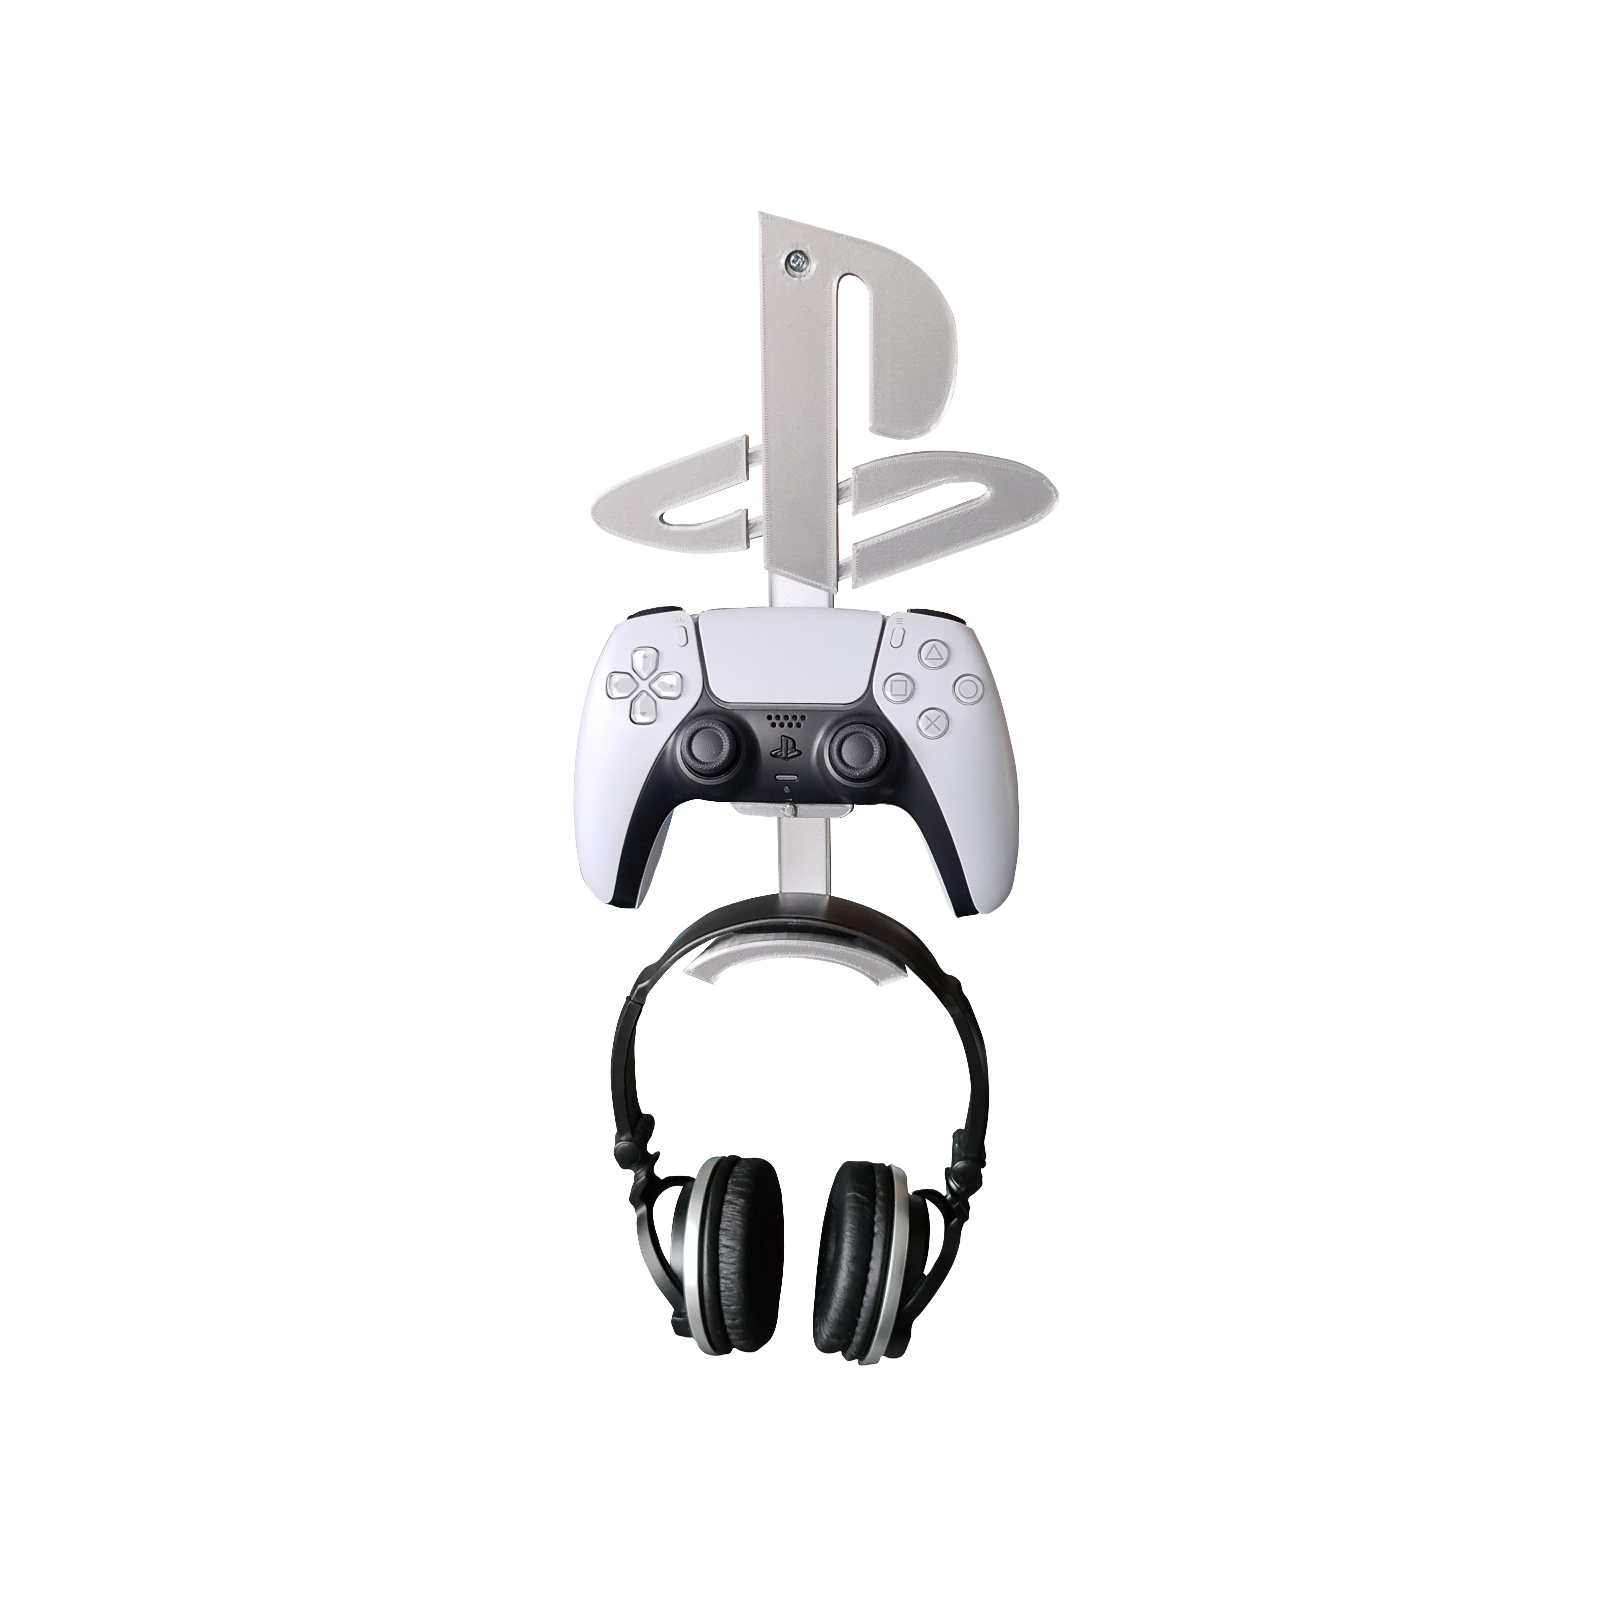 Playstation 5 Headphones & Controller Wall Mount Logo